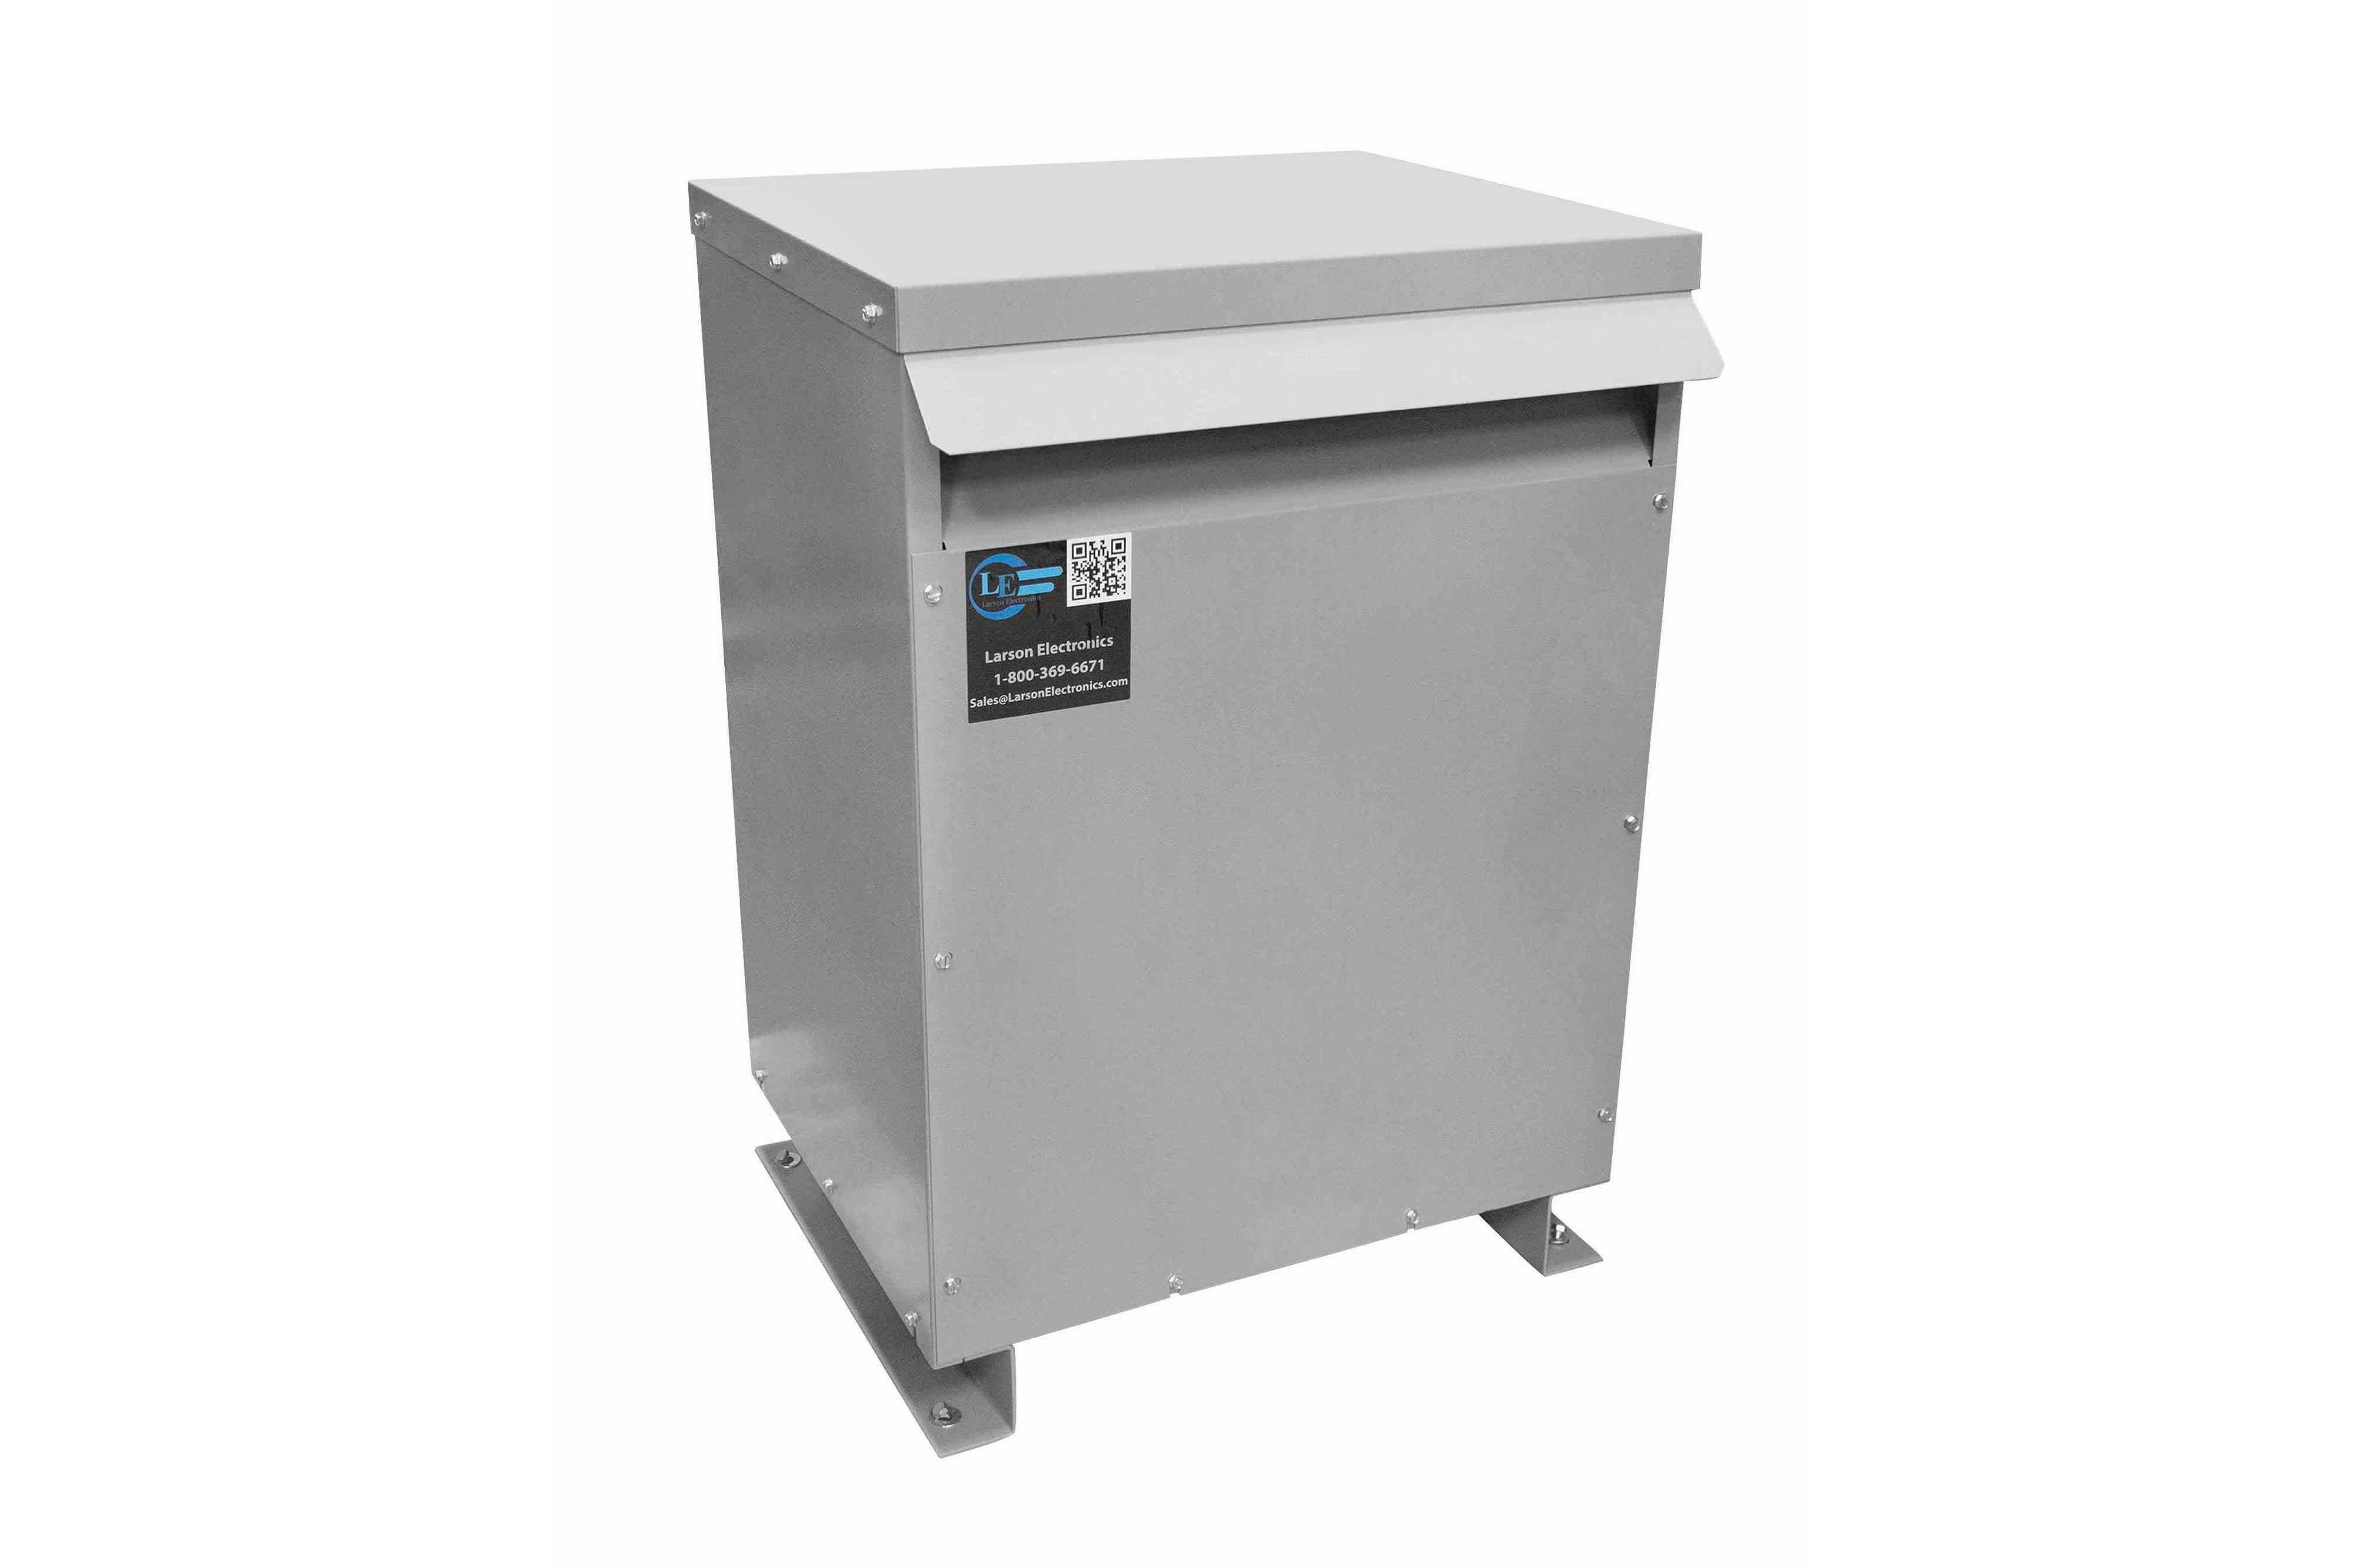 750 kVA 3PH DOE Transformer, 208V Delta Primary, 480Y/277 Wye-N Secondary, N3R, Ventilated, 60 Hz